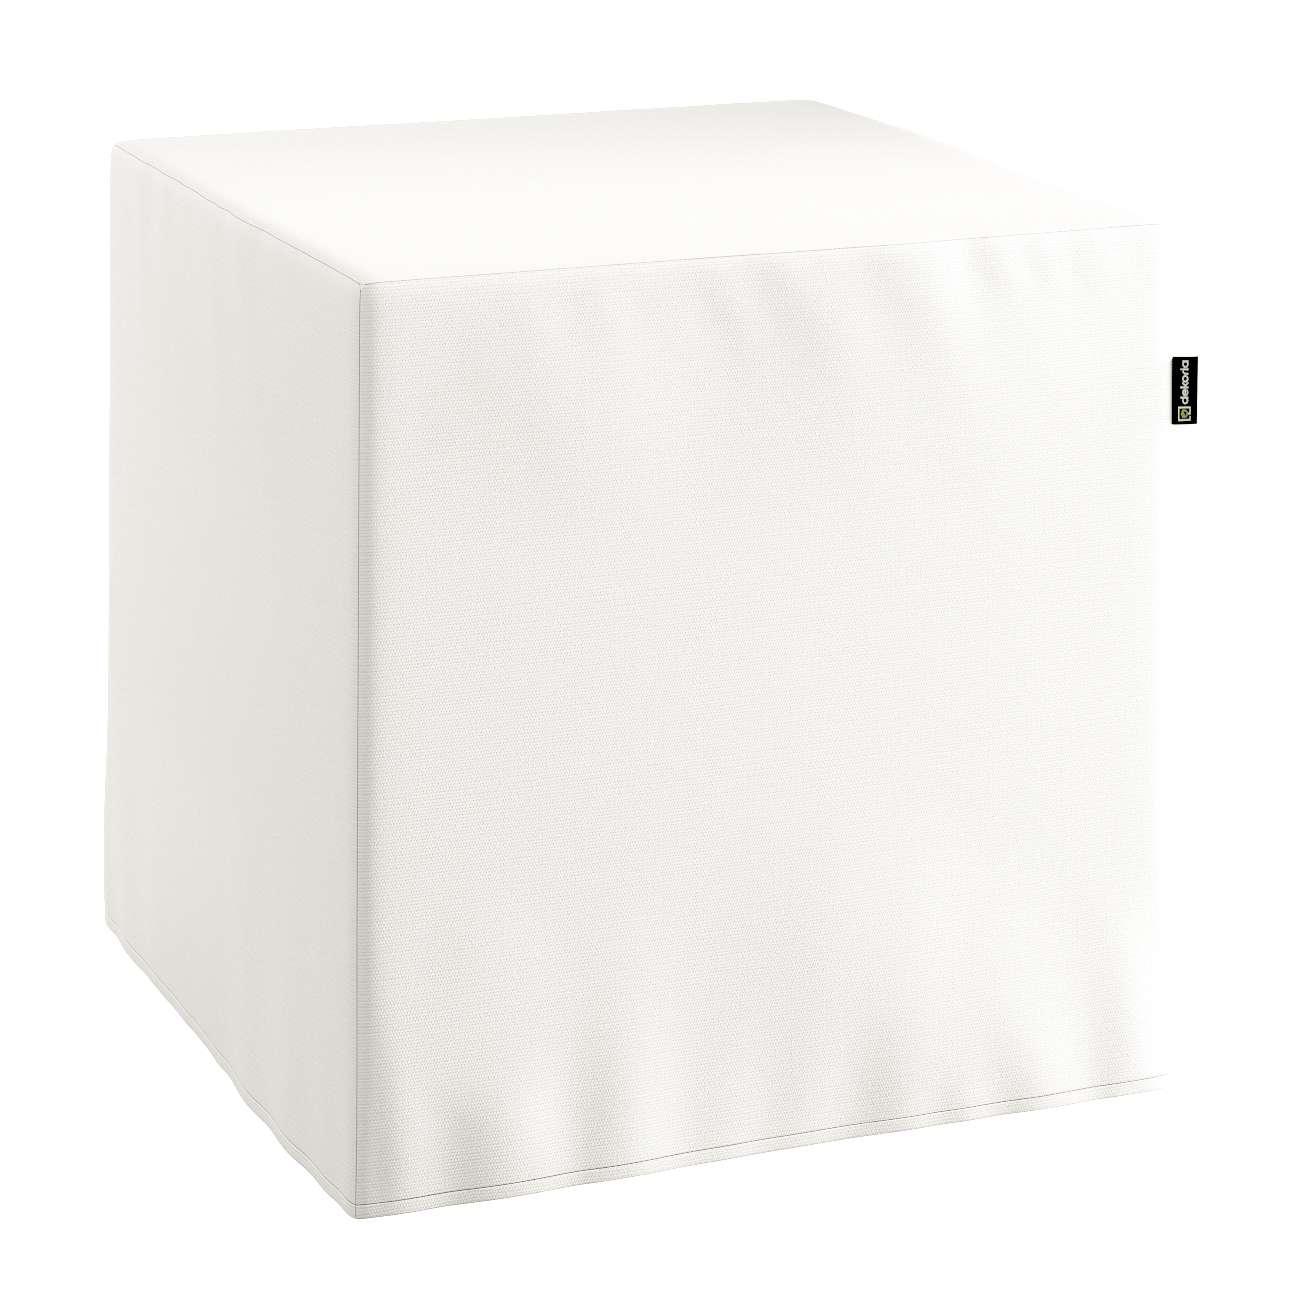 Sedák kostka - pevná 40x40x40 40 x 40 x 40 cm v kolekci Cotton Panama, látka: 702-34